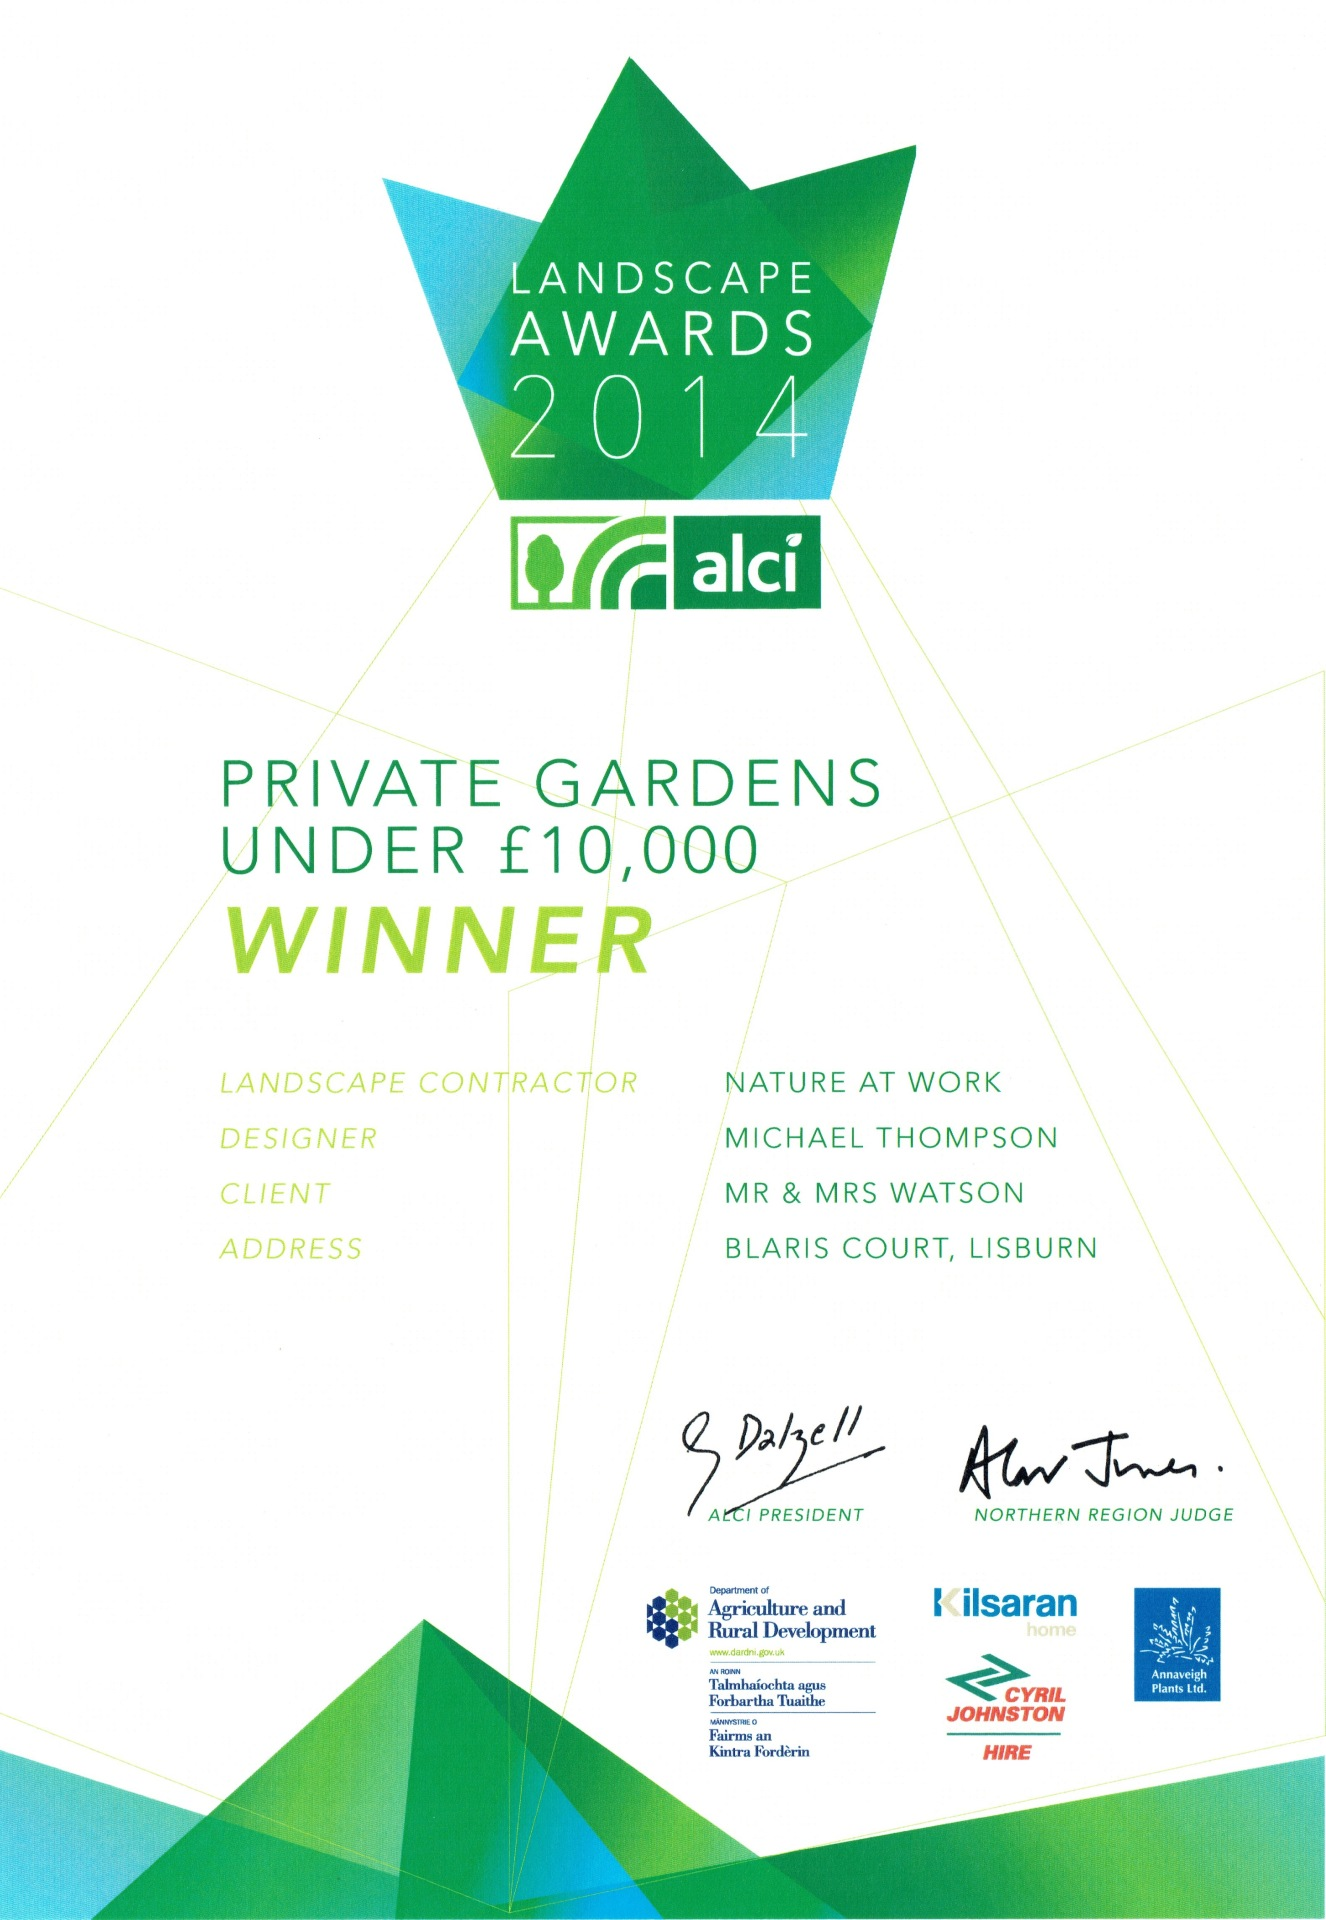 ALCI Landscape Awards 2014 Private Gardens Under £10,000